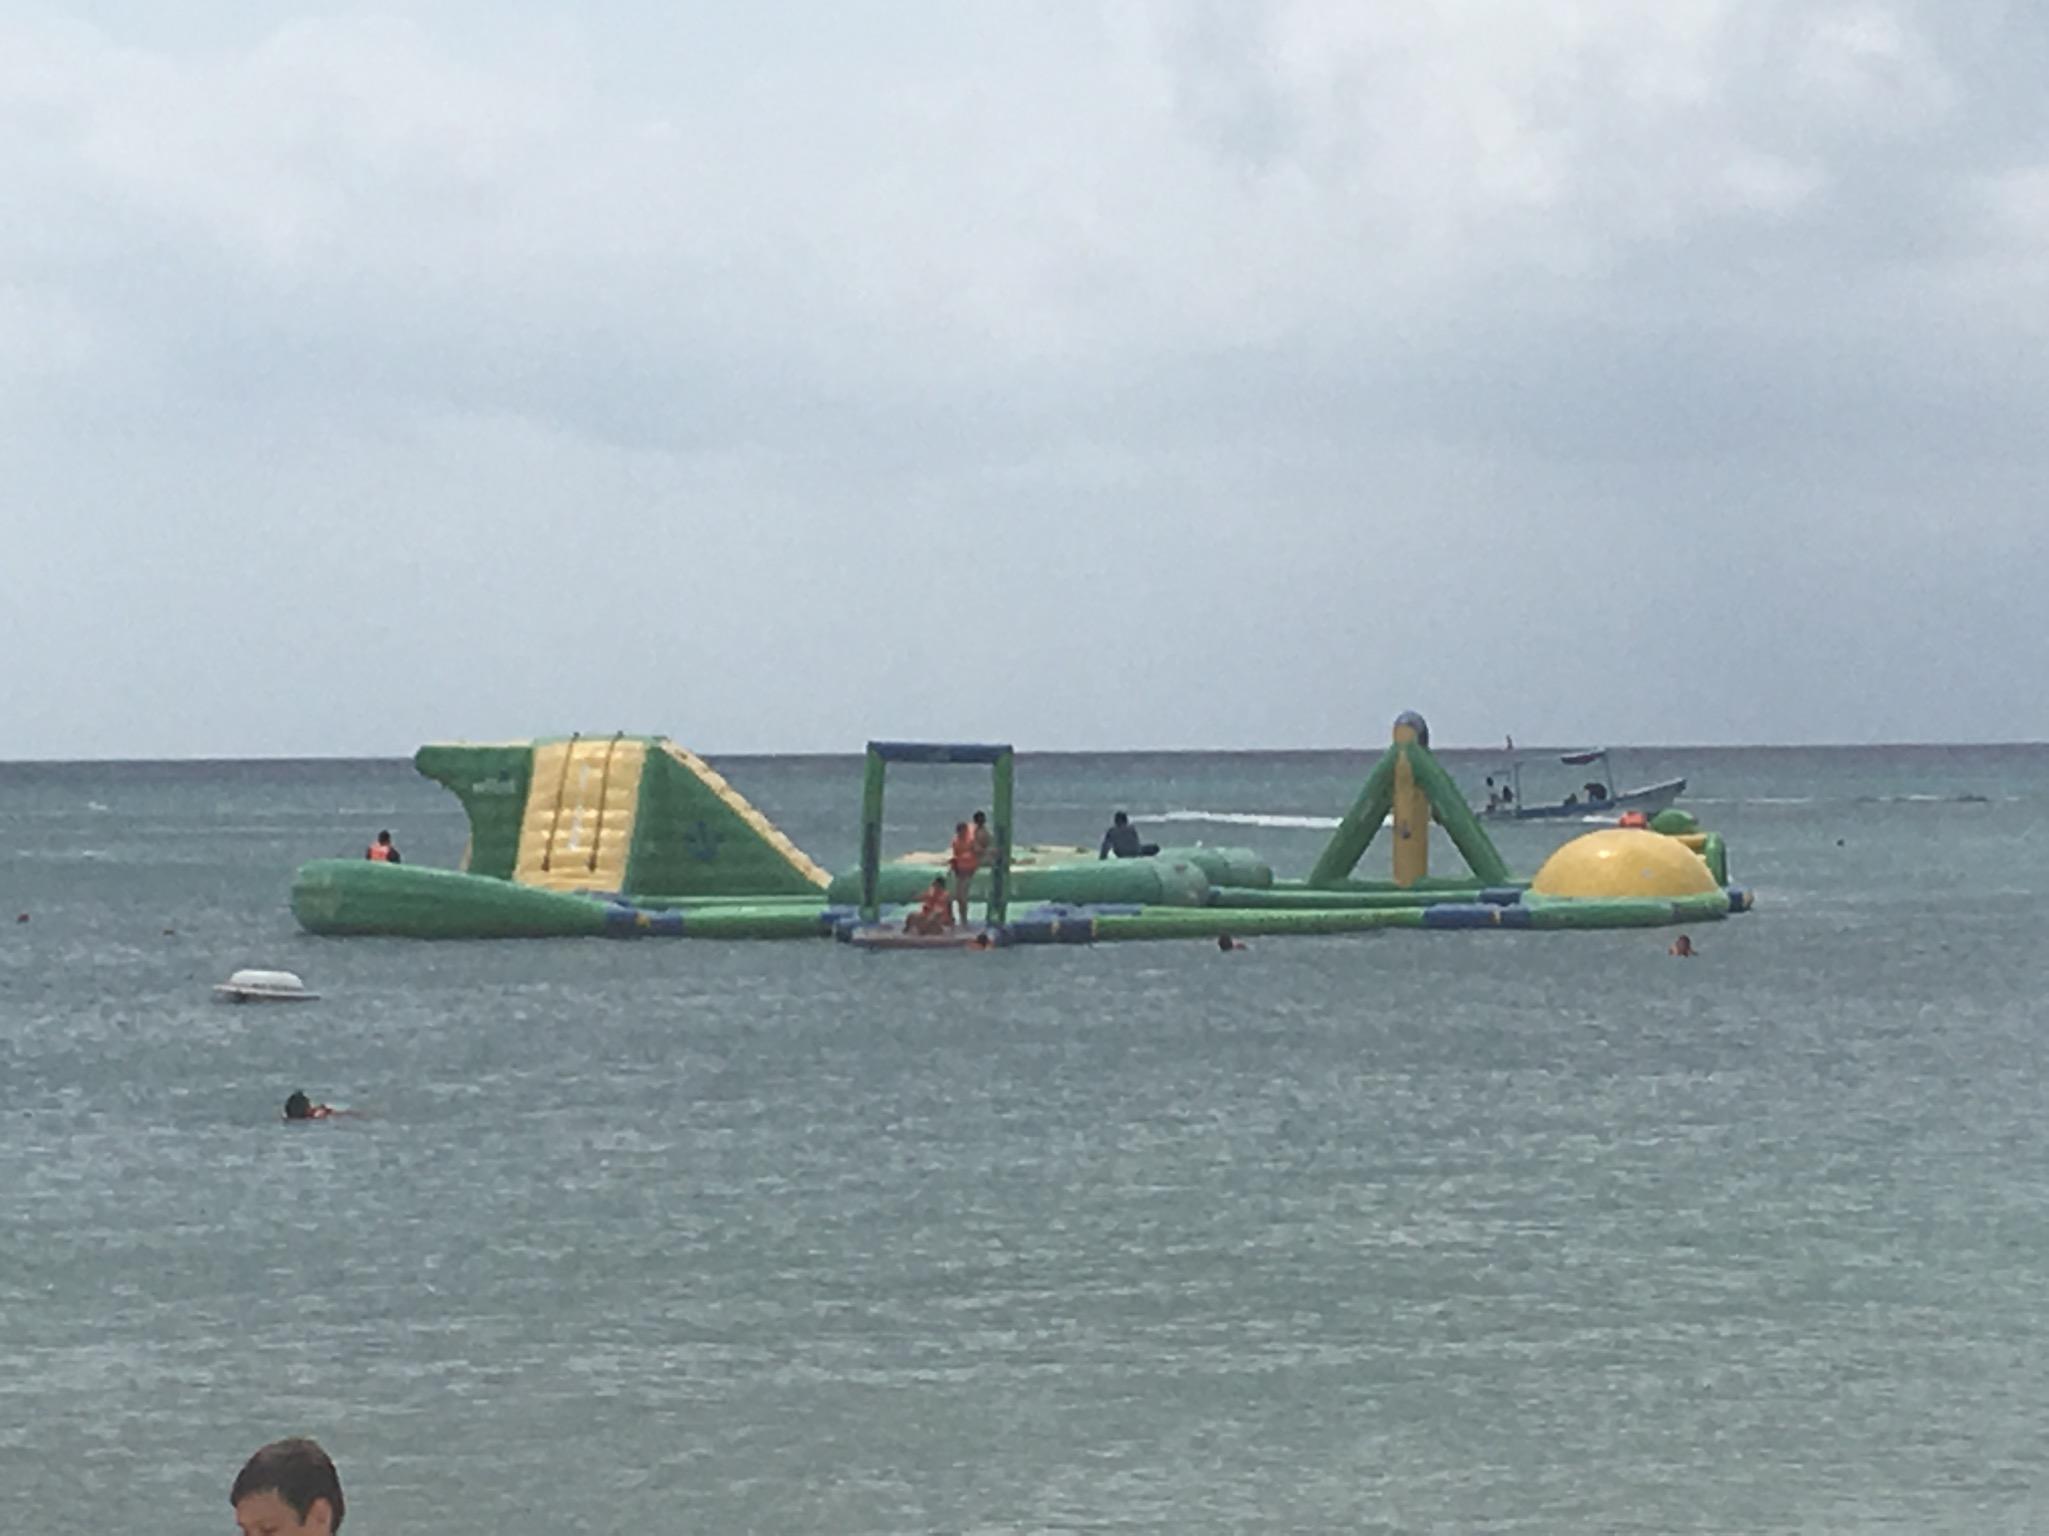 Beach Club Inflatable play